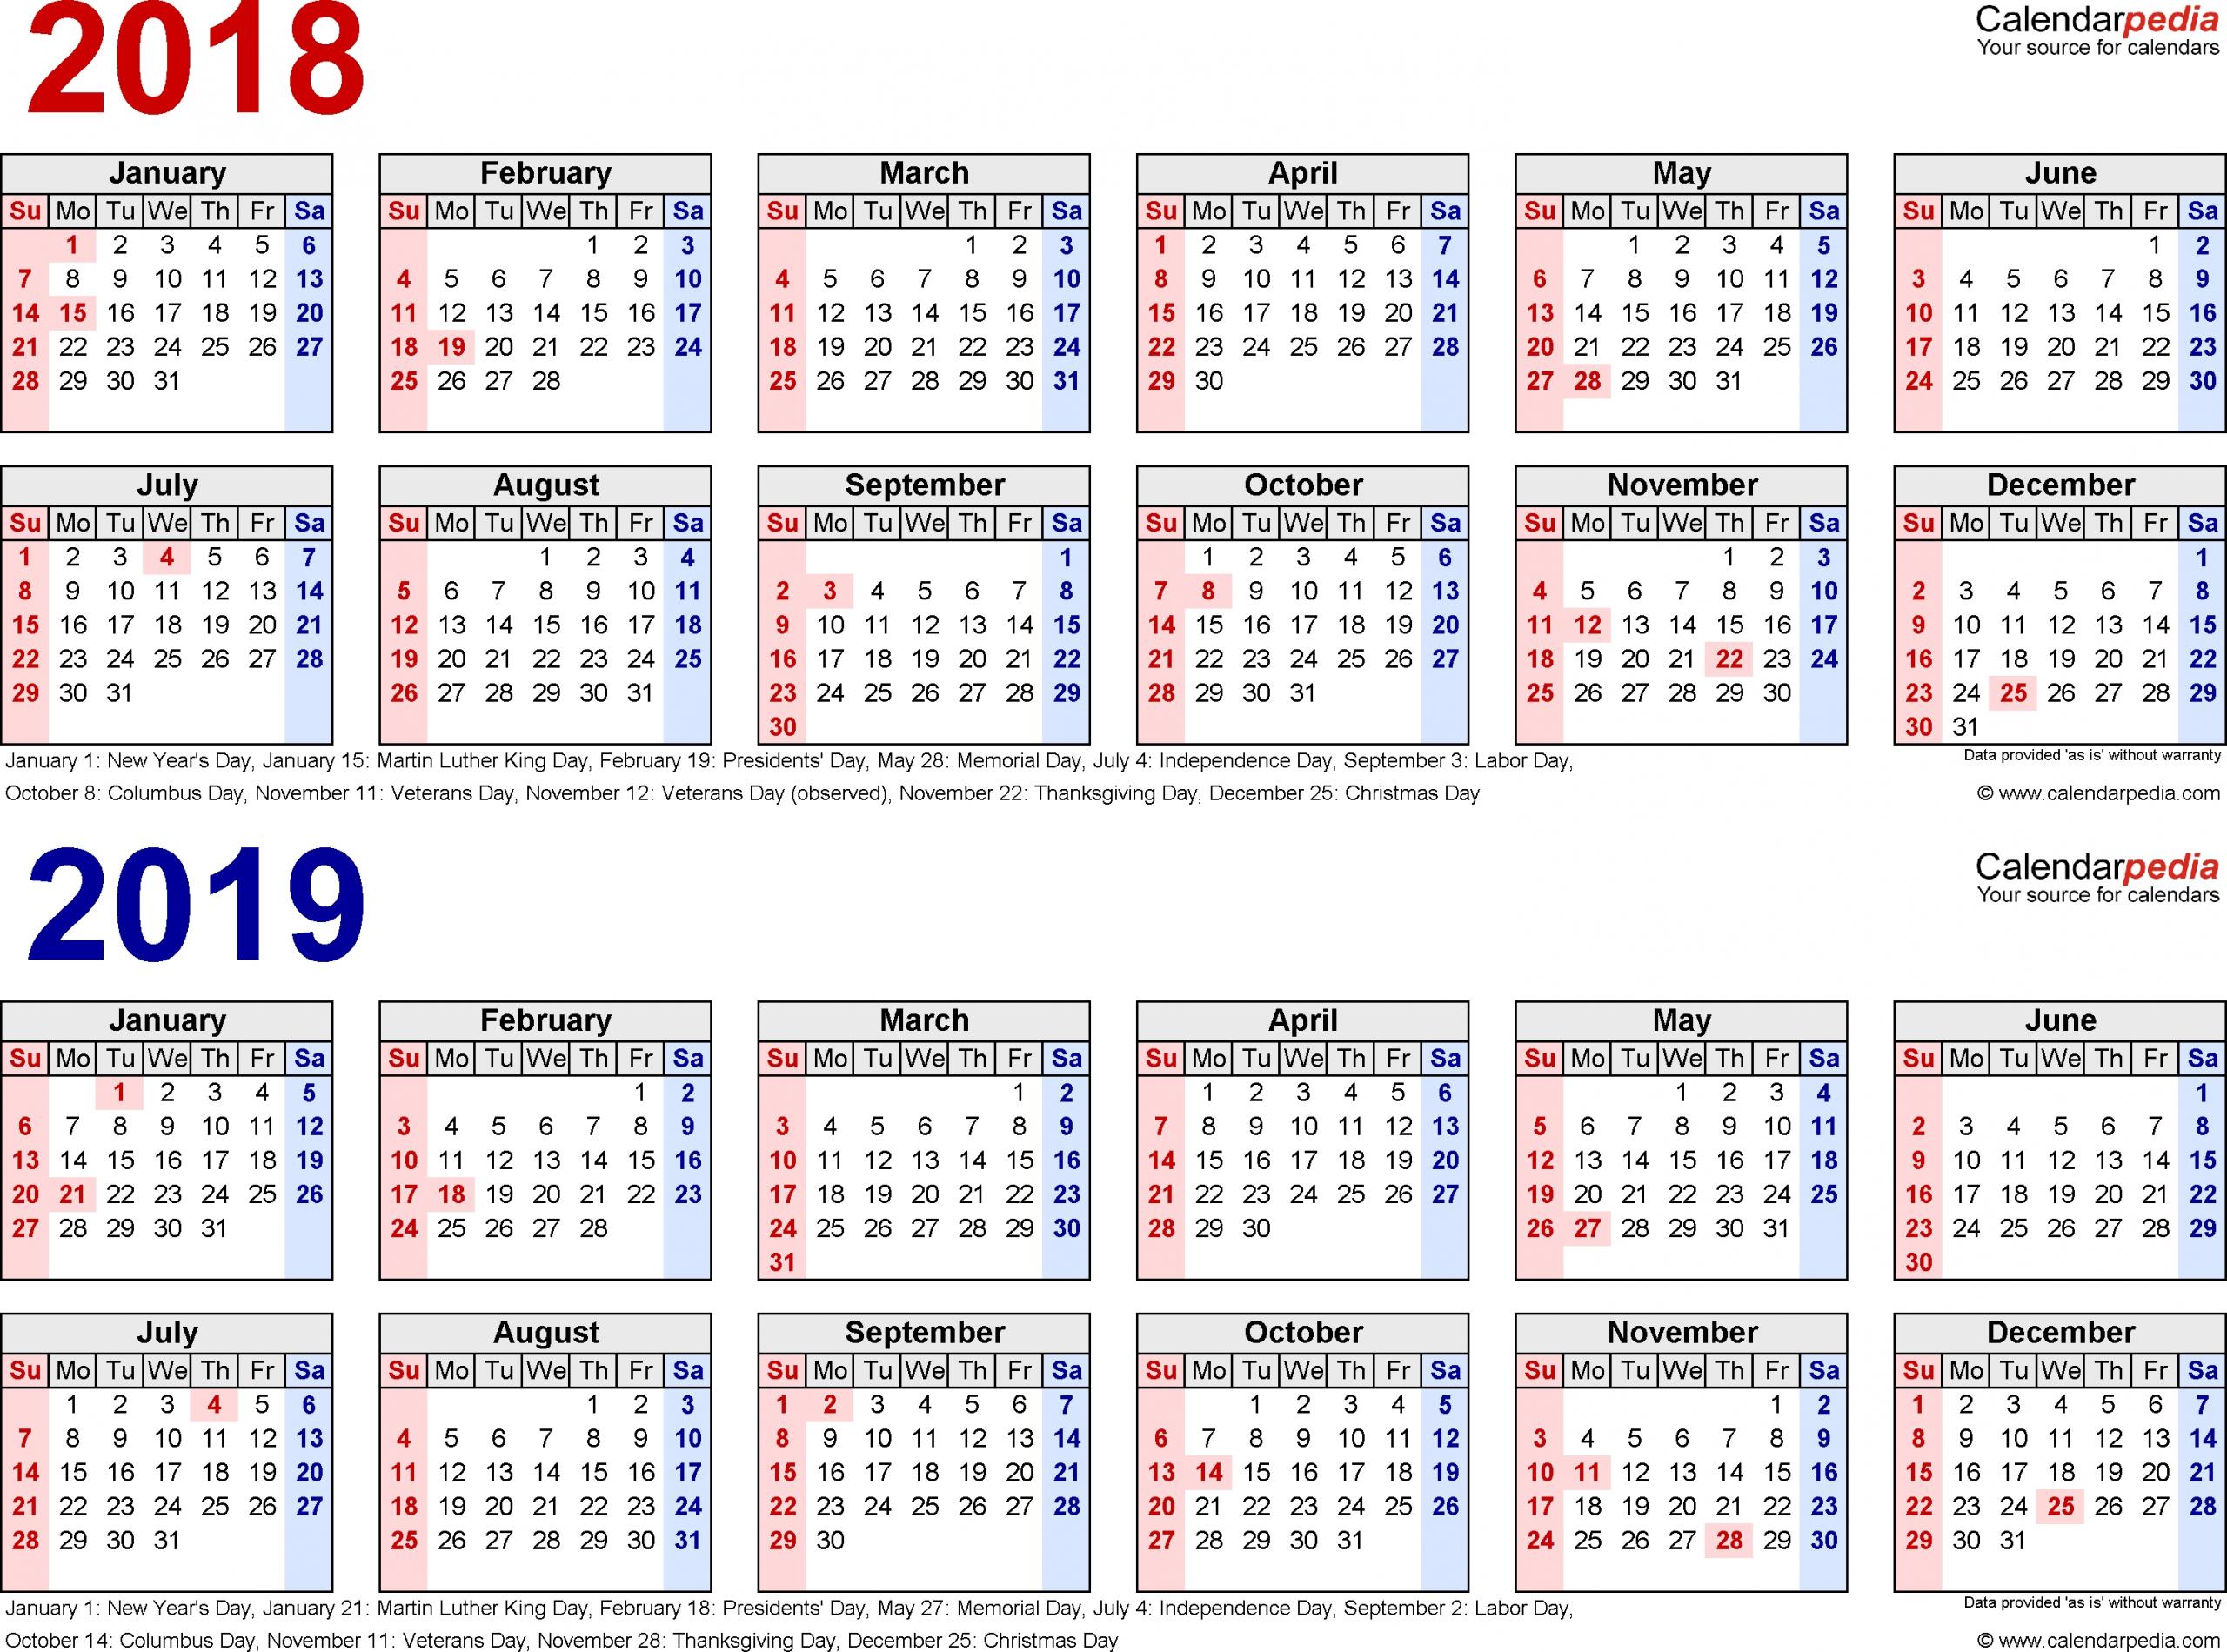 3 Year Calendar Printable 2018 2019 2020 – Calendar Multiple Year Printable Calendar